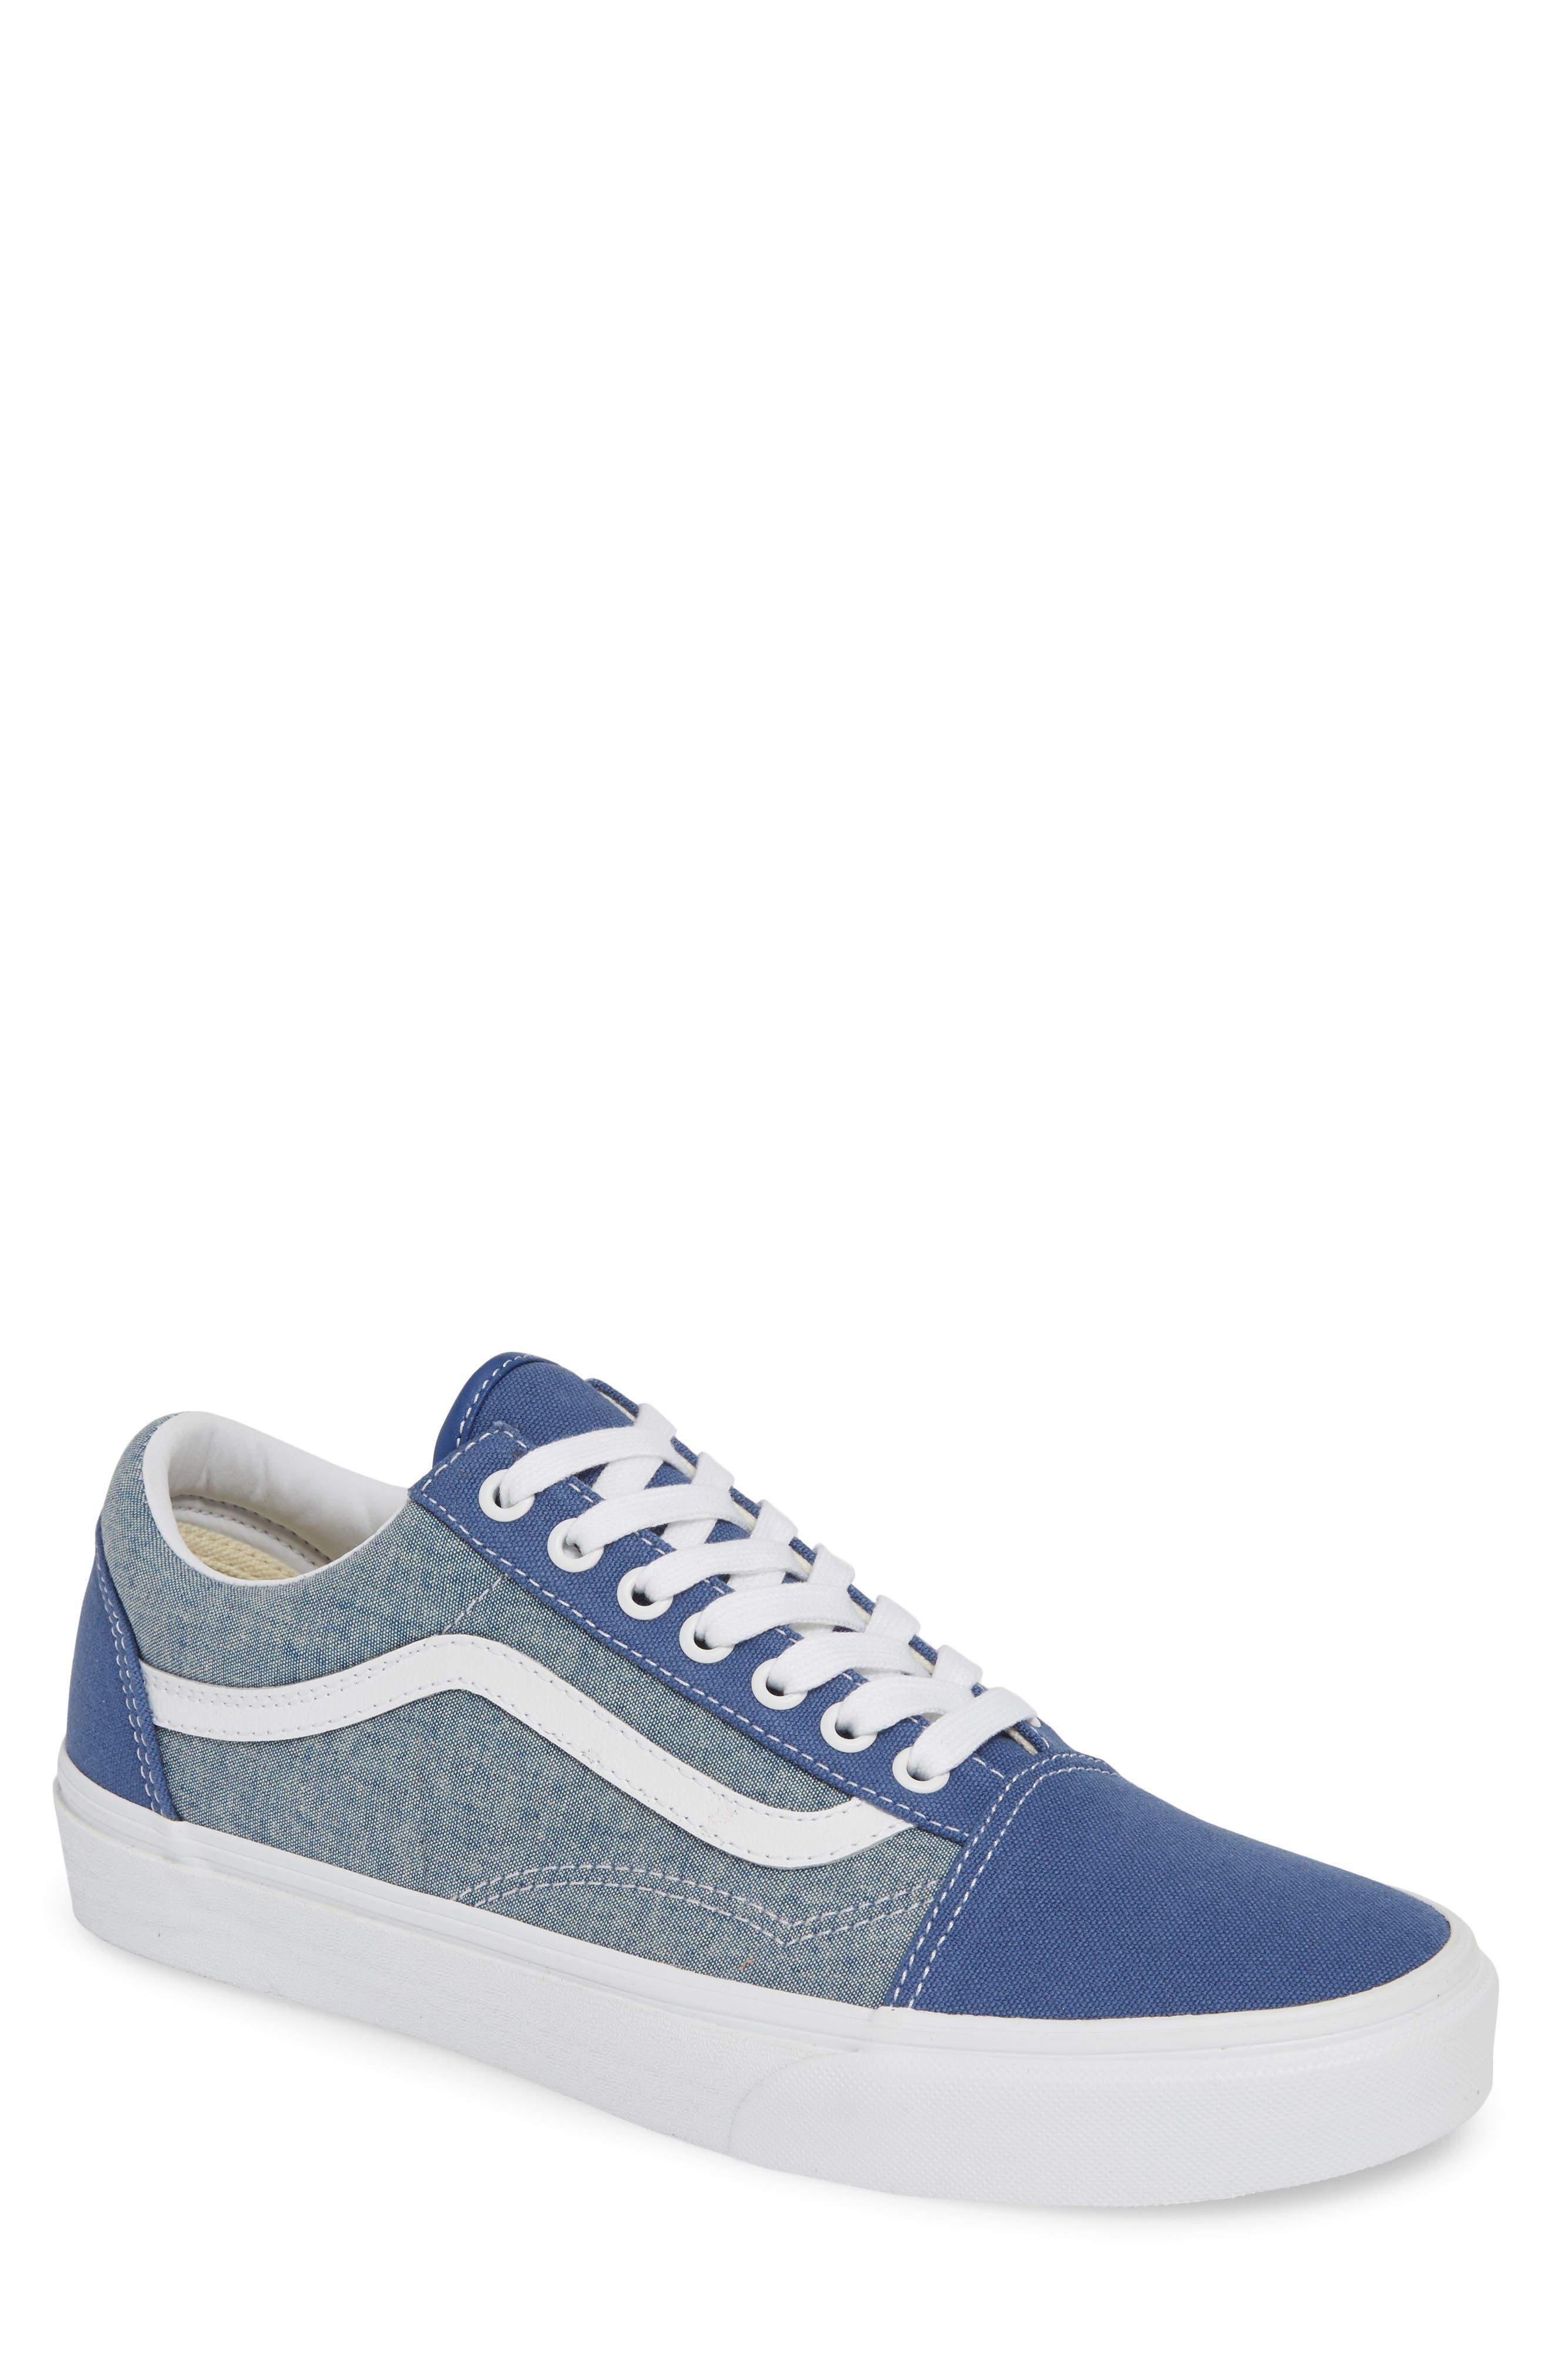 VANS, Old Skool Sneaker, Main thumbnail 1, color, CANVAS NAVY/ WHITE CHAMBRAY